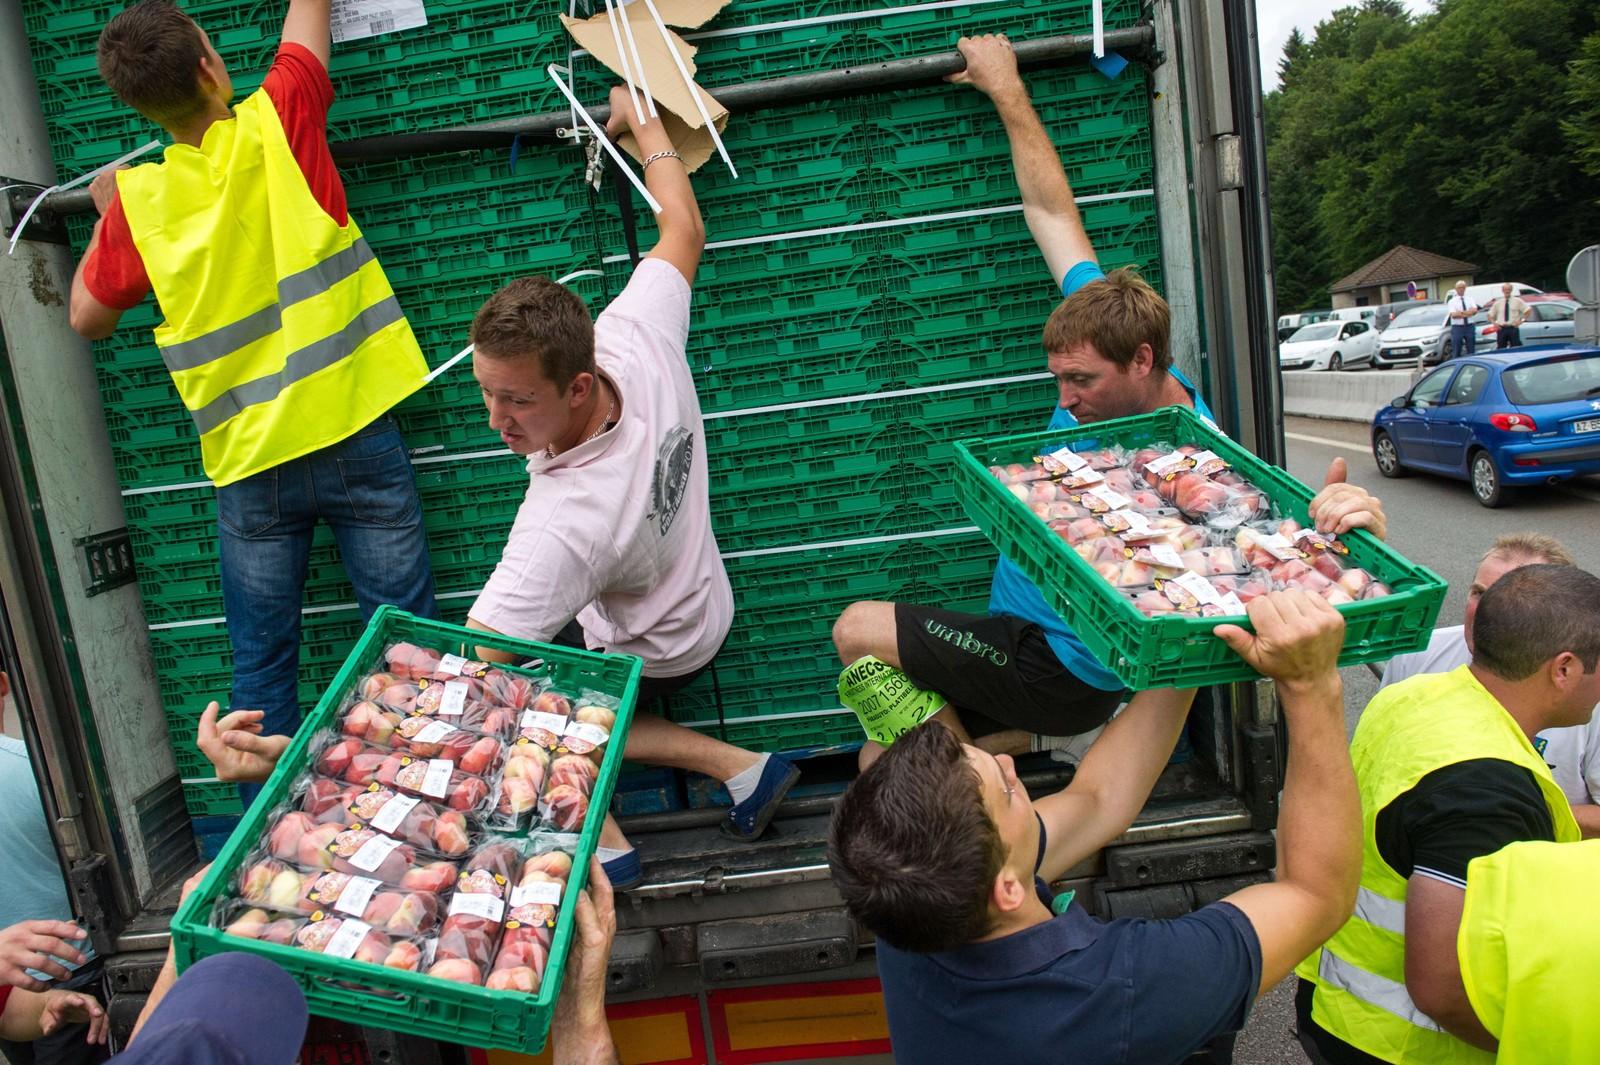 Protesterende bønder tømmer en lastebil med frukt i L'Isle-sur-le-Doubs.